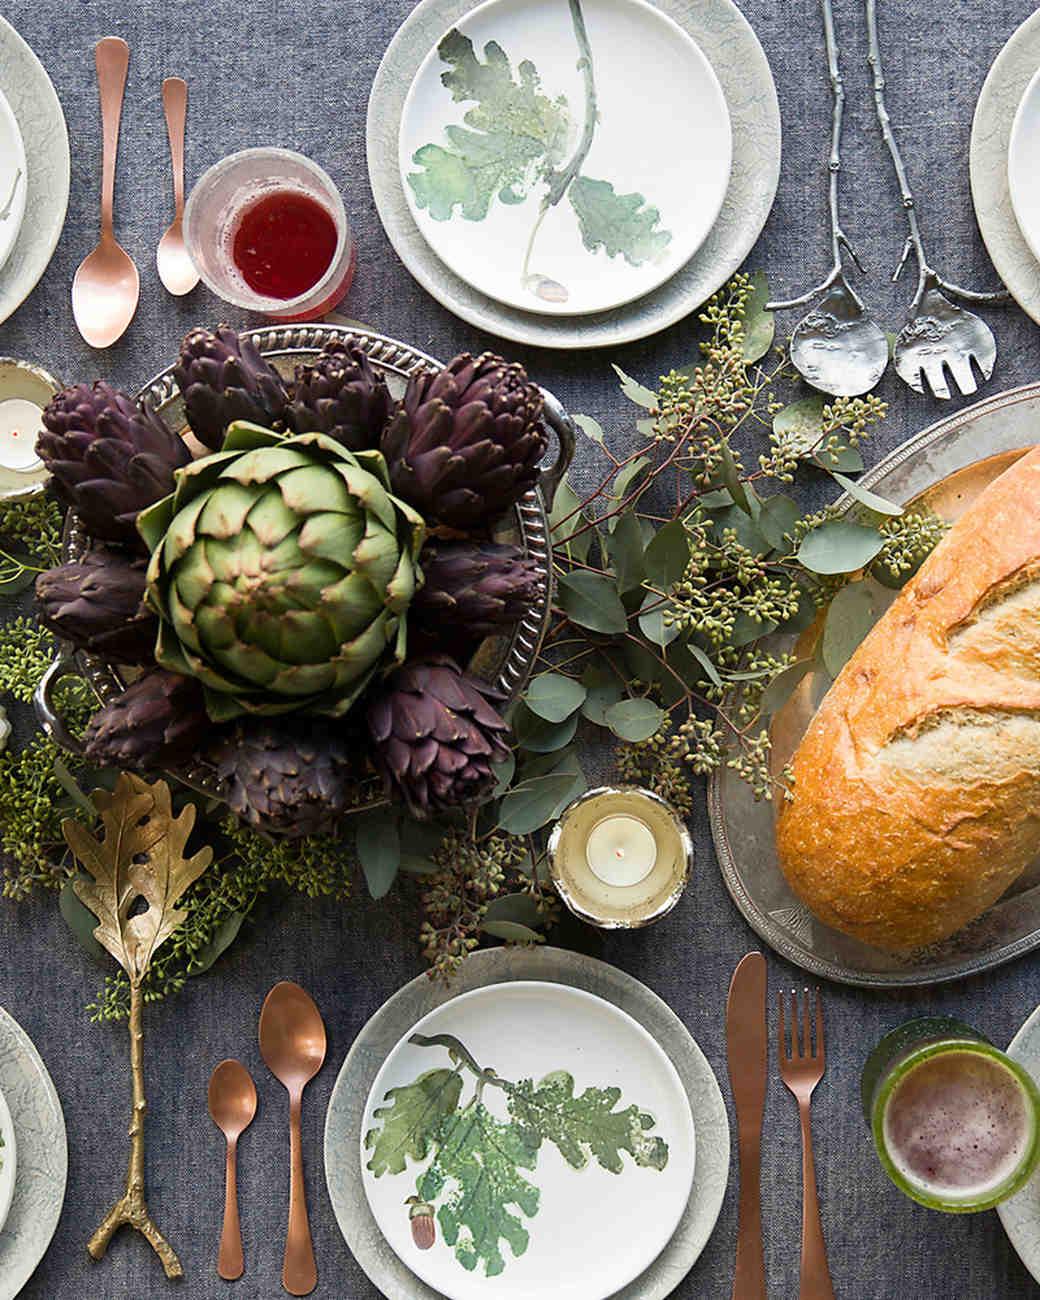 blueprint-thanksgiving-traditional-family-intro-1114.jpg